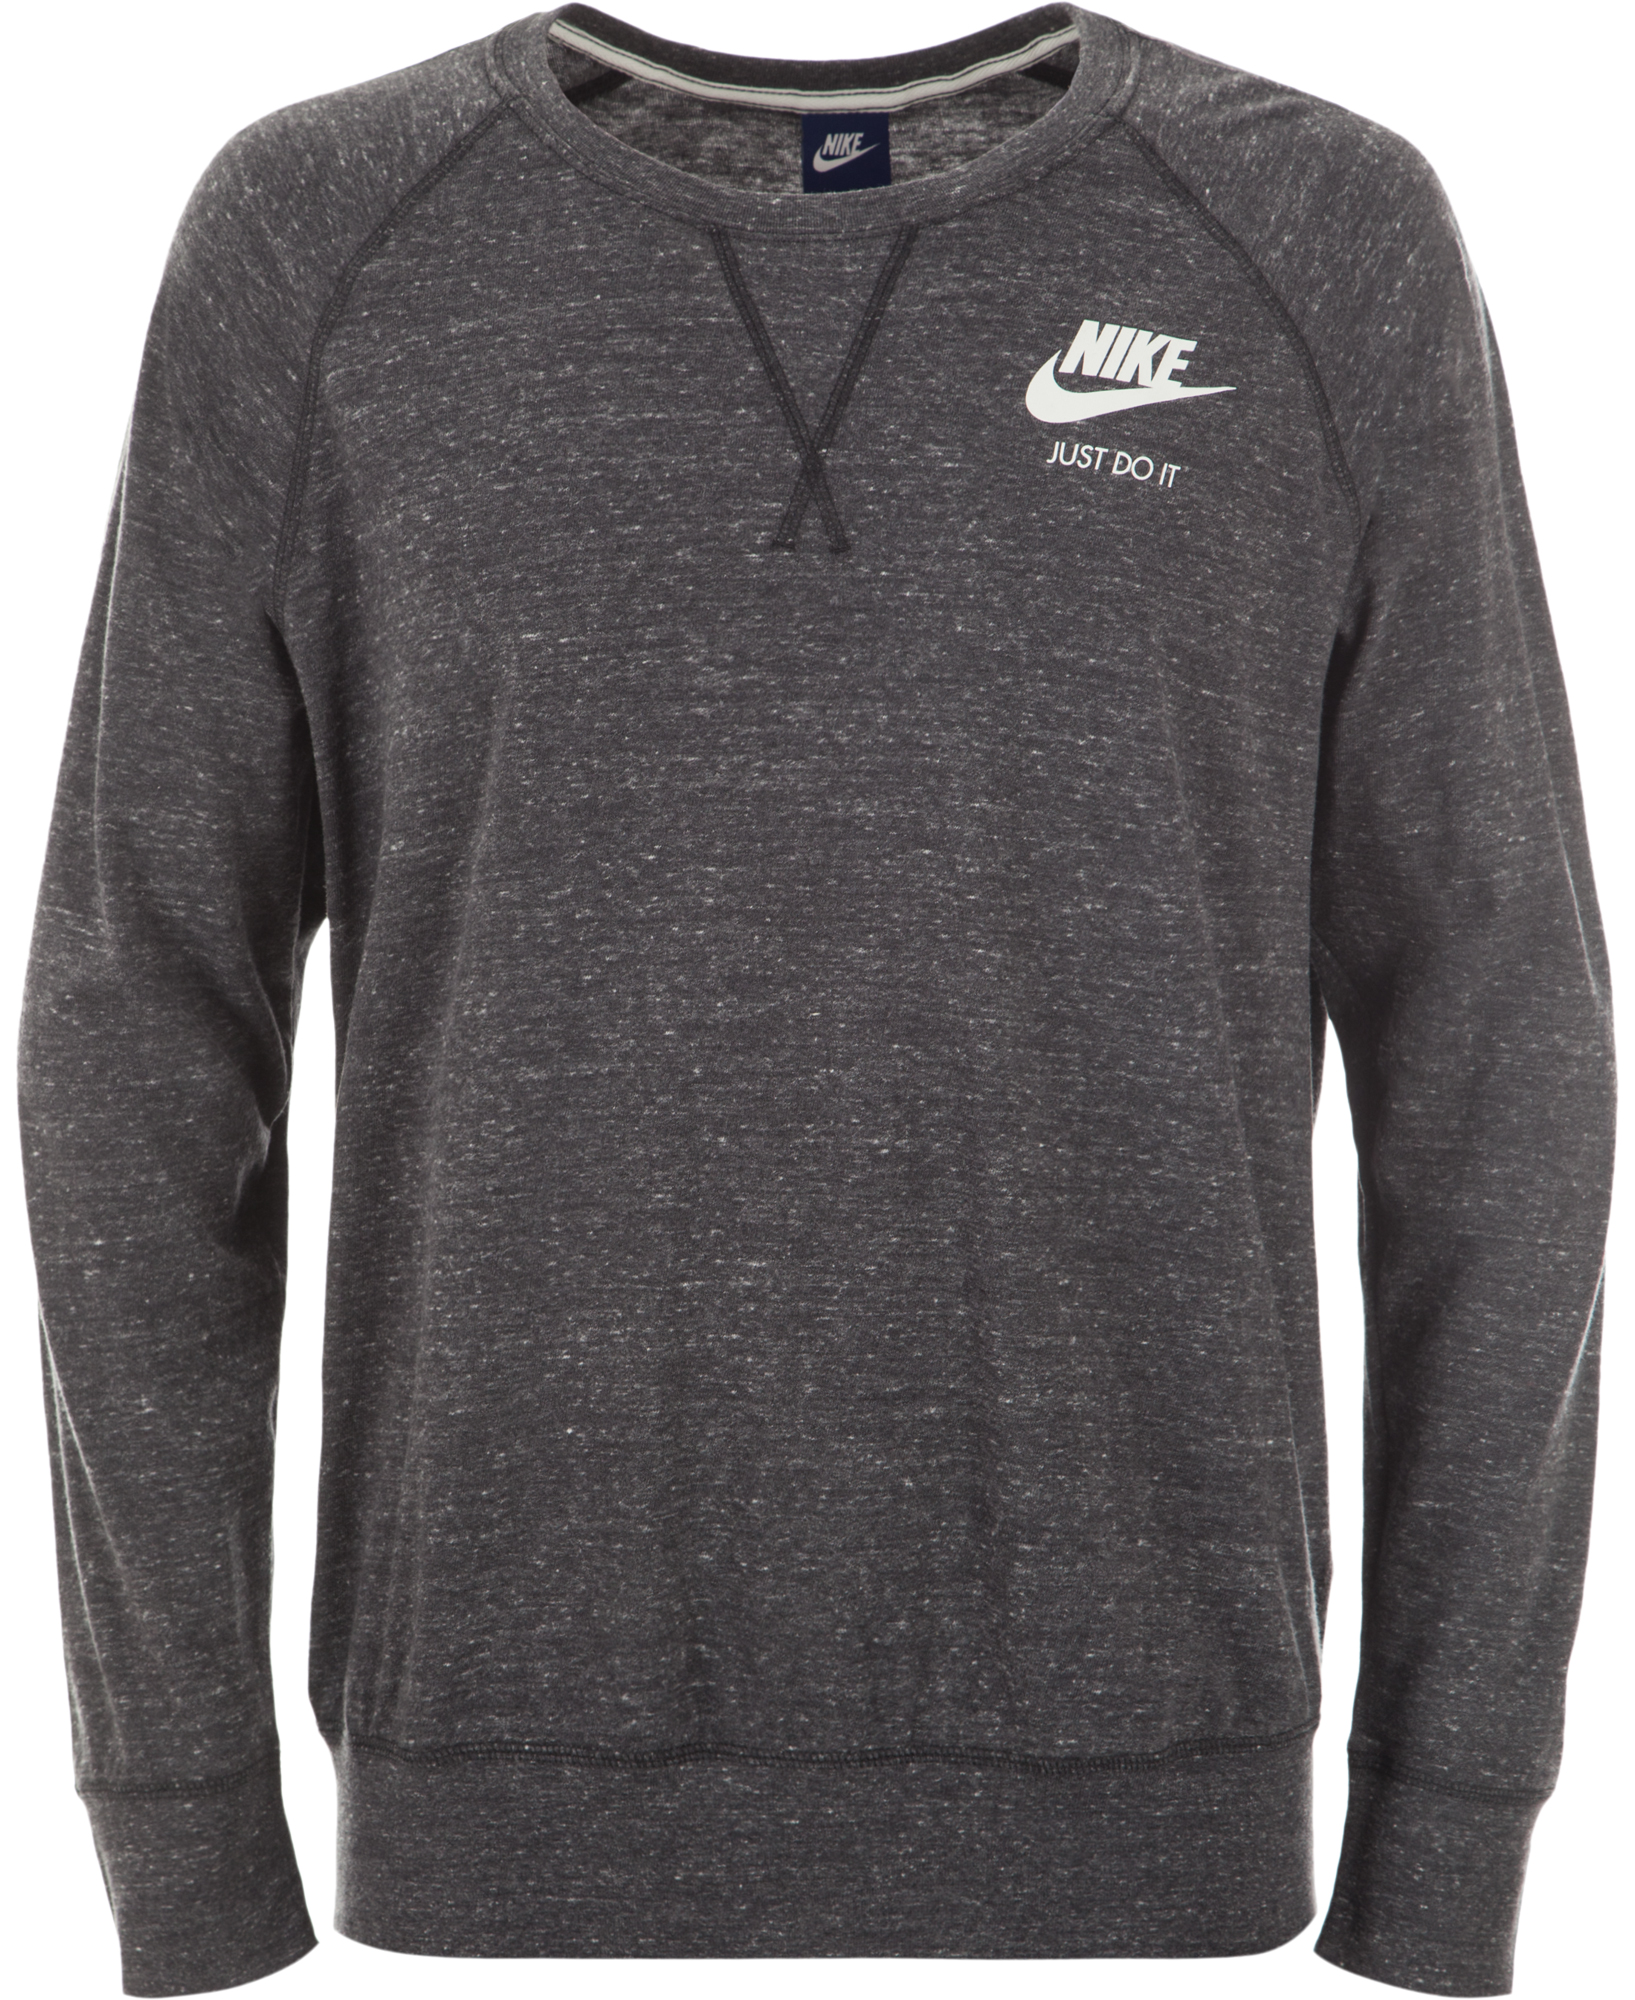 Nike Джемпер женский Nike Sportswear Gym Vintage джемпер в полоску catimini ут 00009343